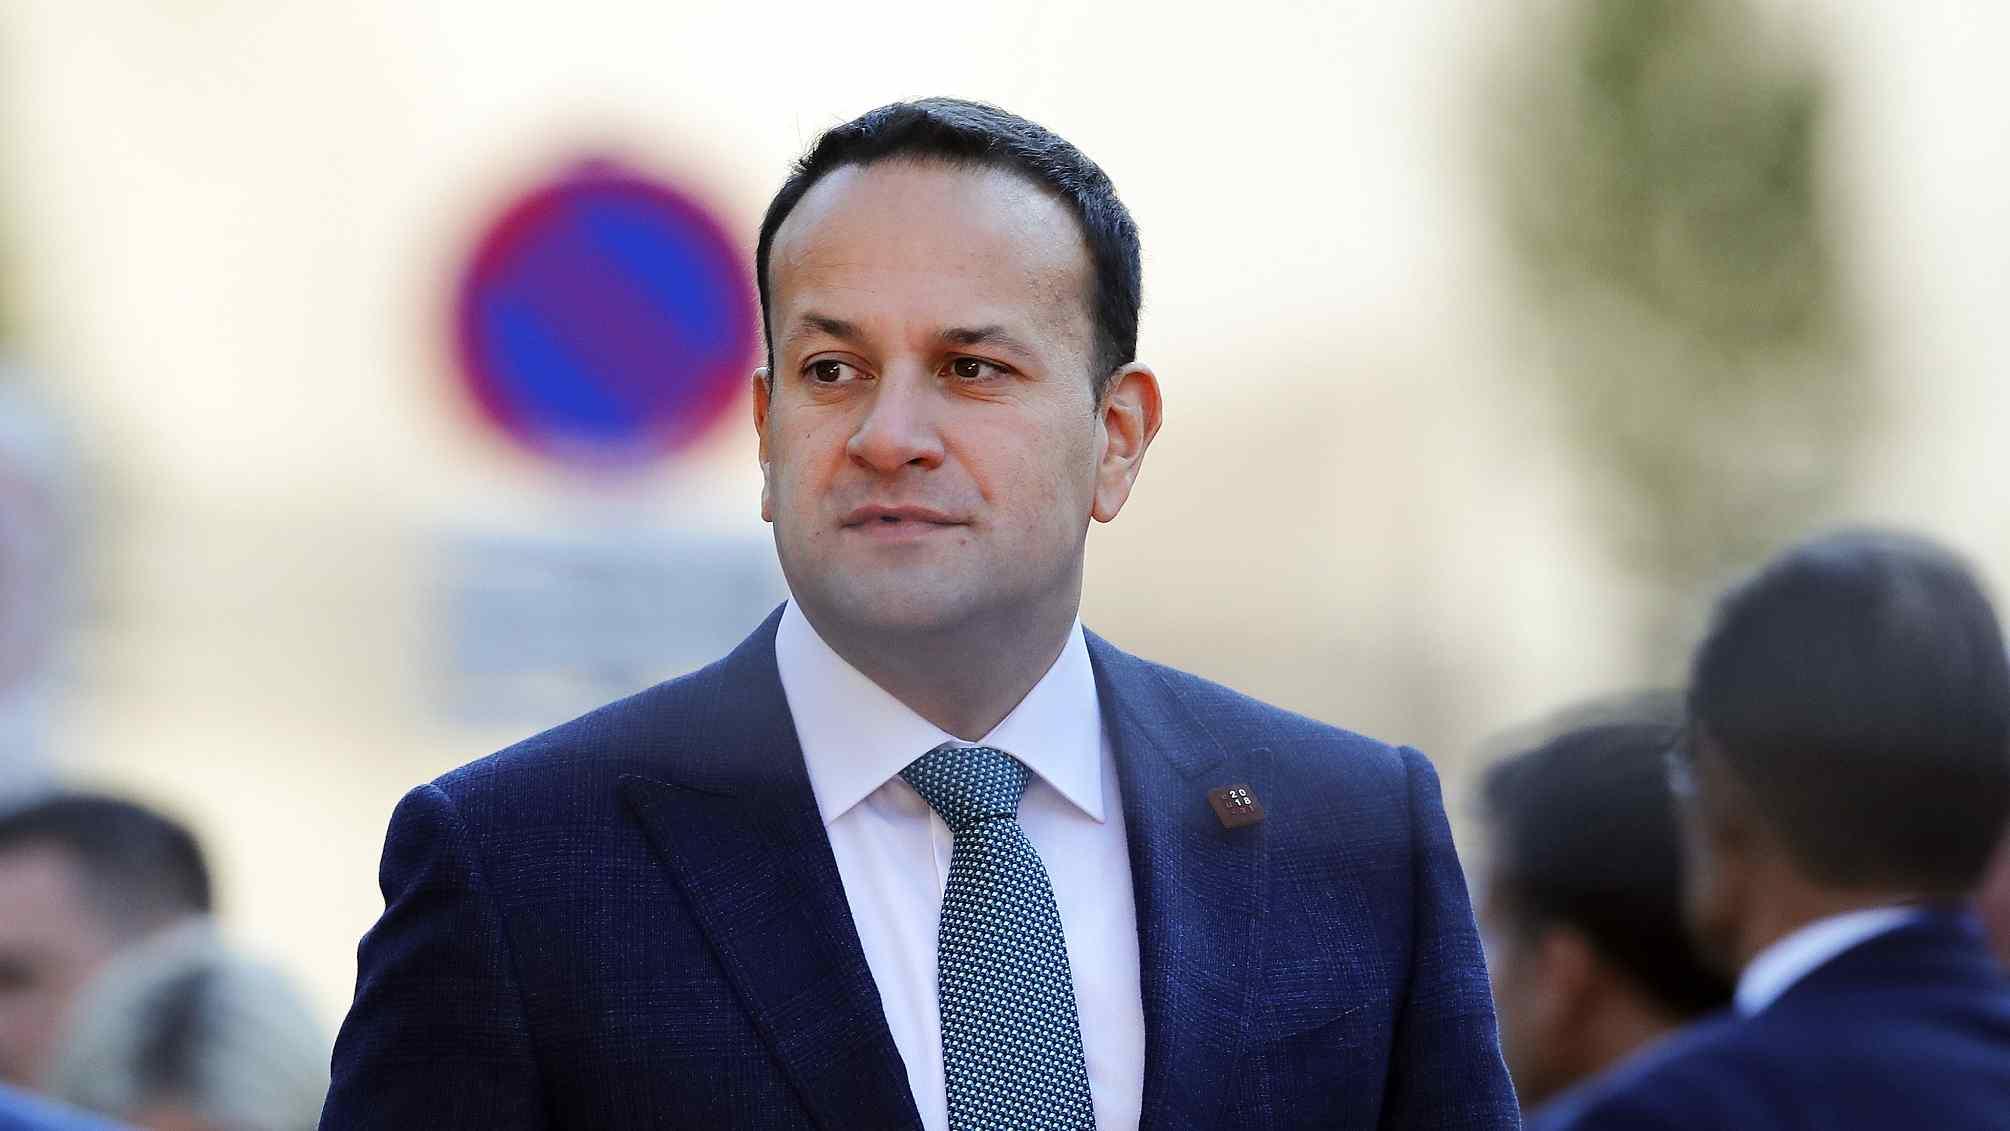 Israel condemns Irish parliament advances anti-settlement bill